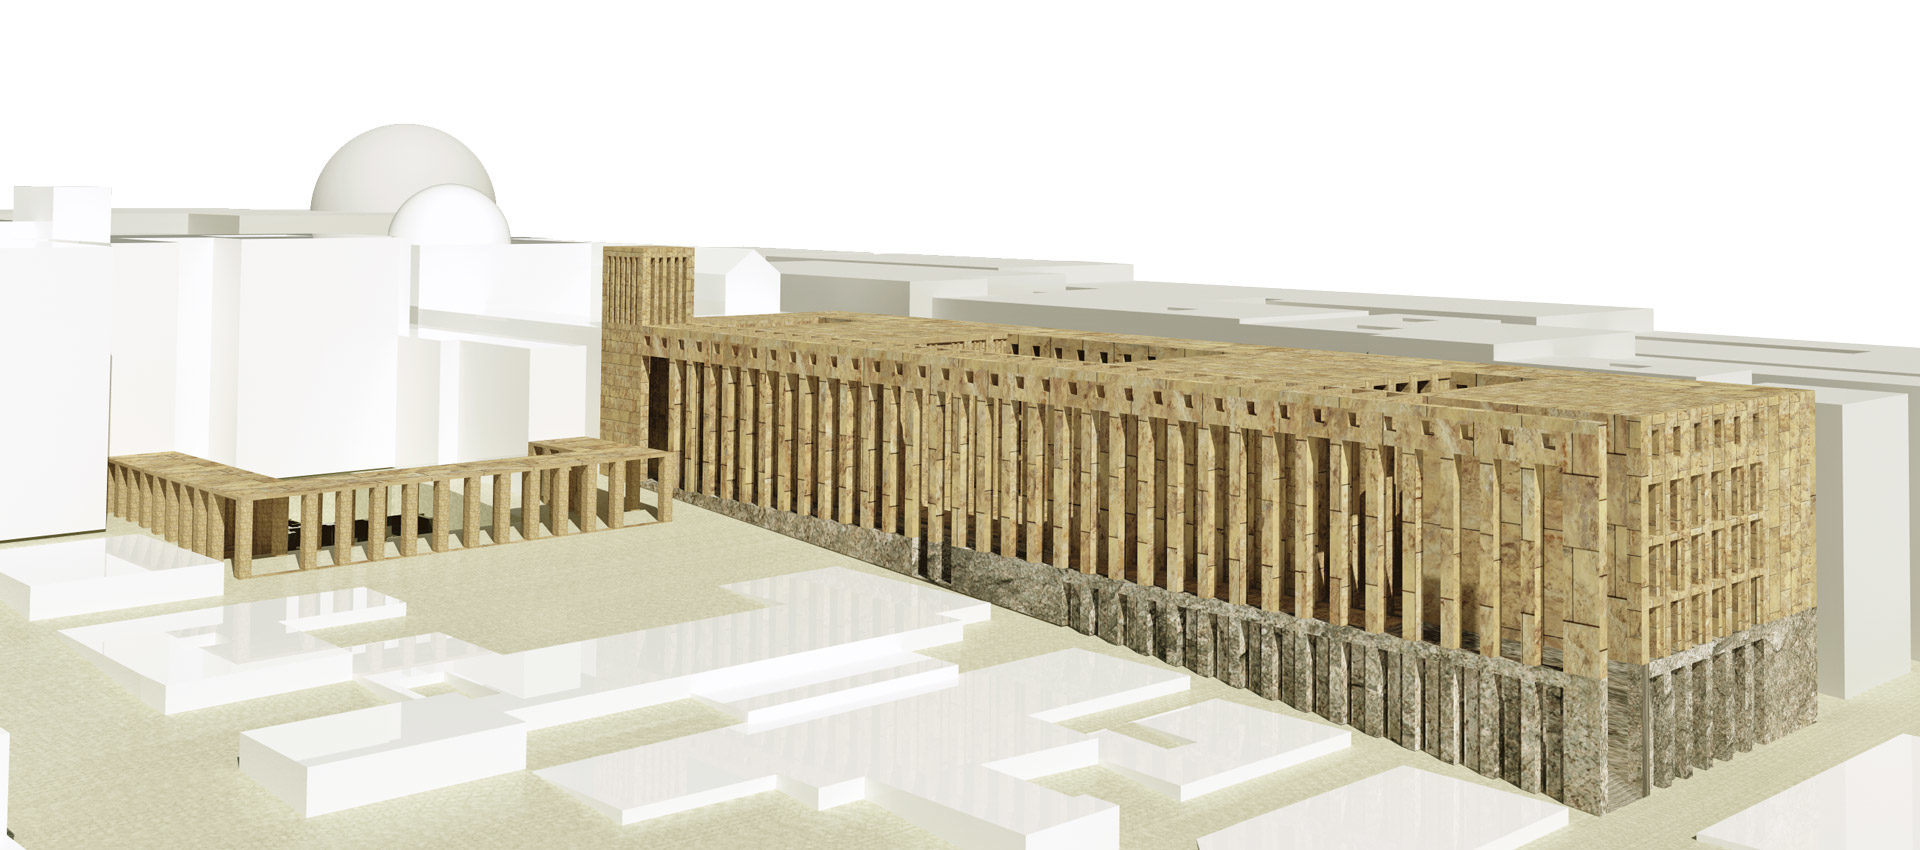 render of citadel of religions of naples